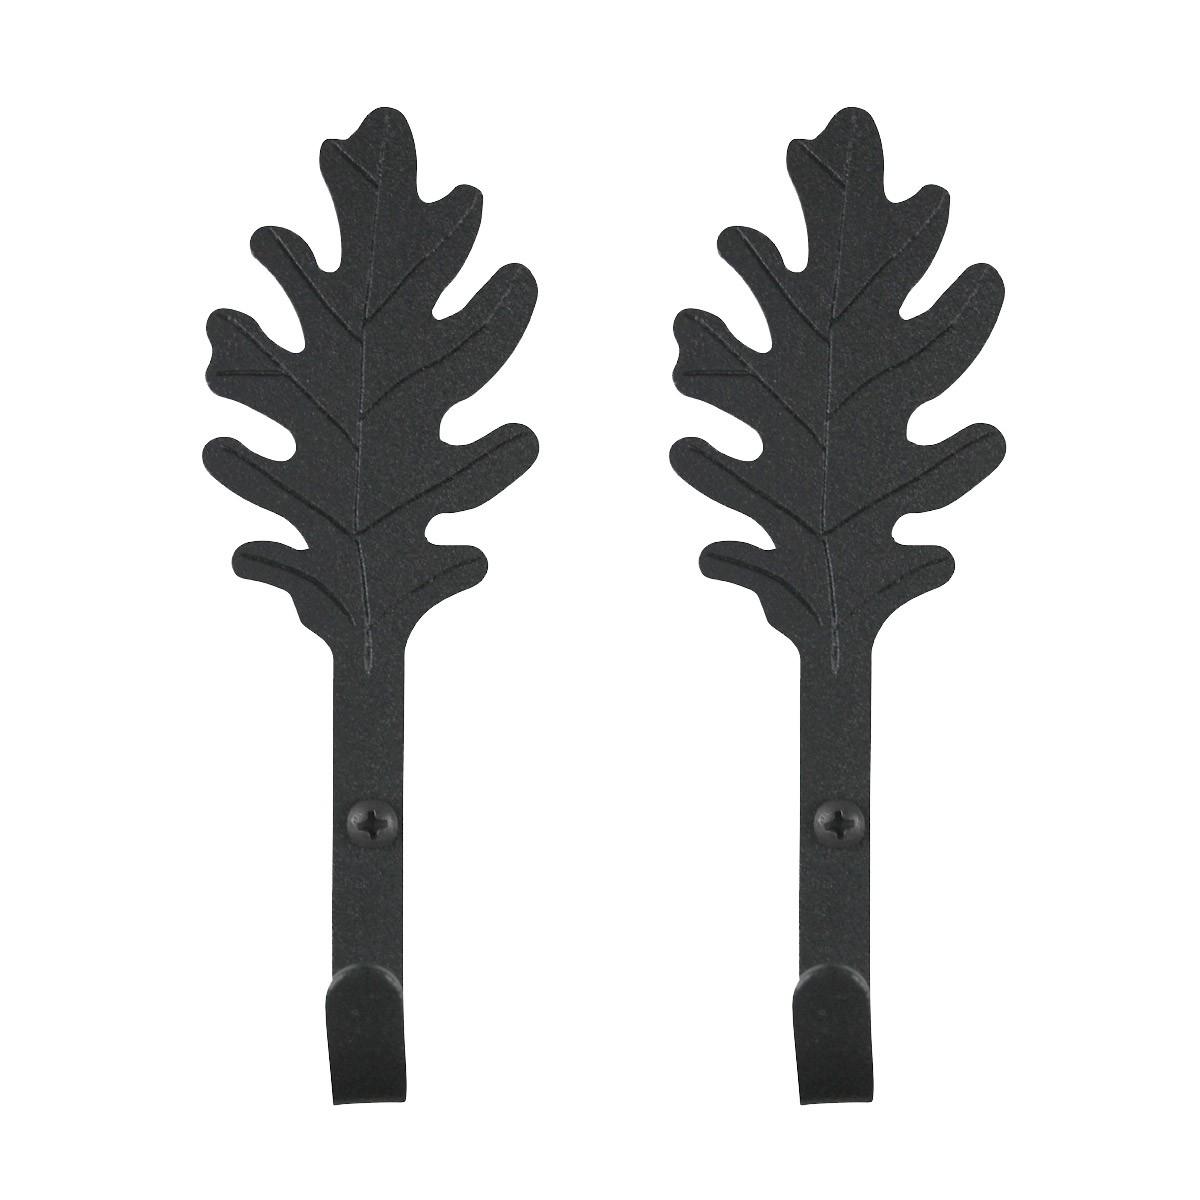 2 Kitchen Hook Wrought Iron Leaf Shape Black  | Renovators Supply